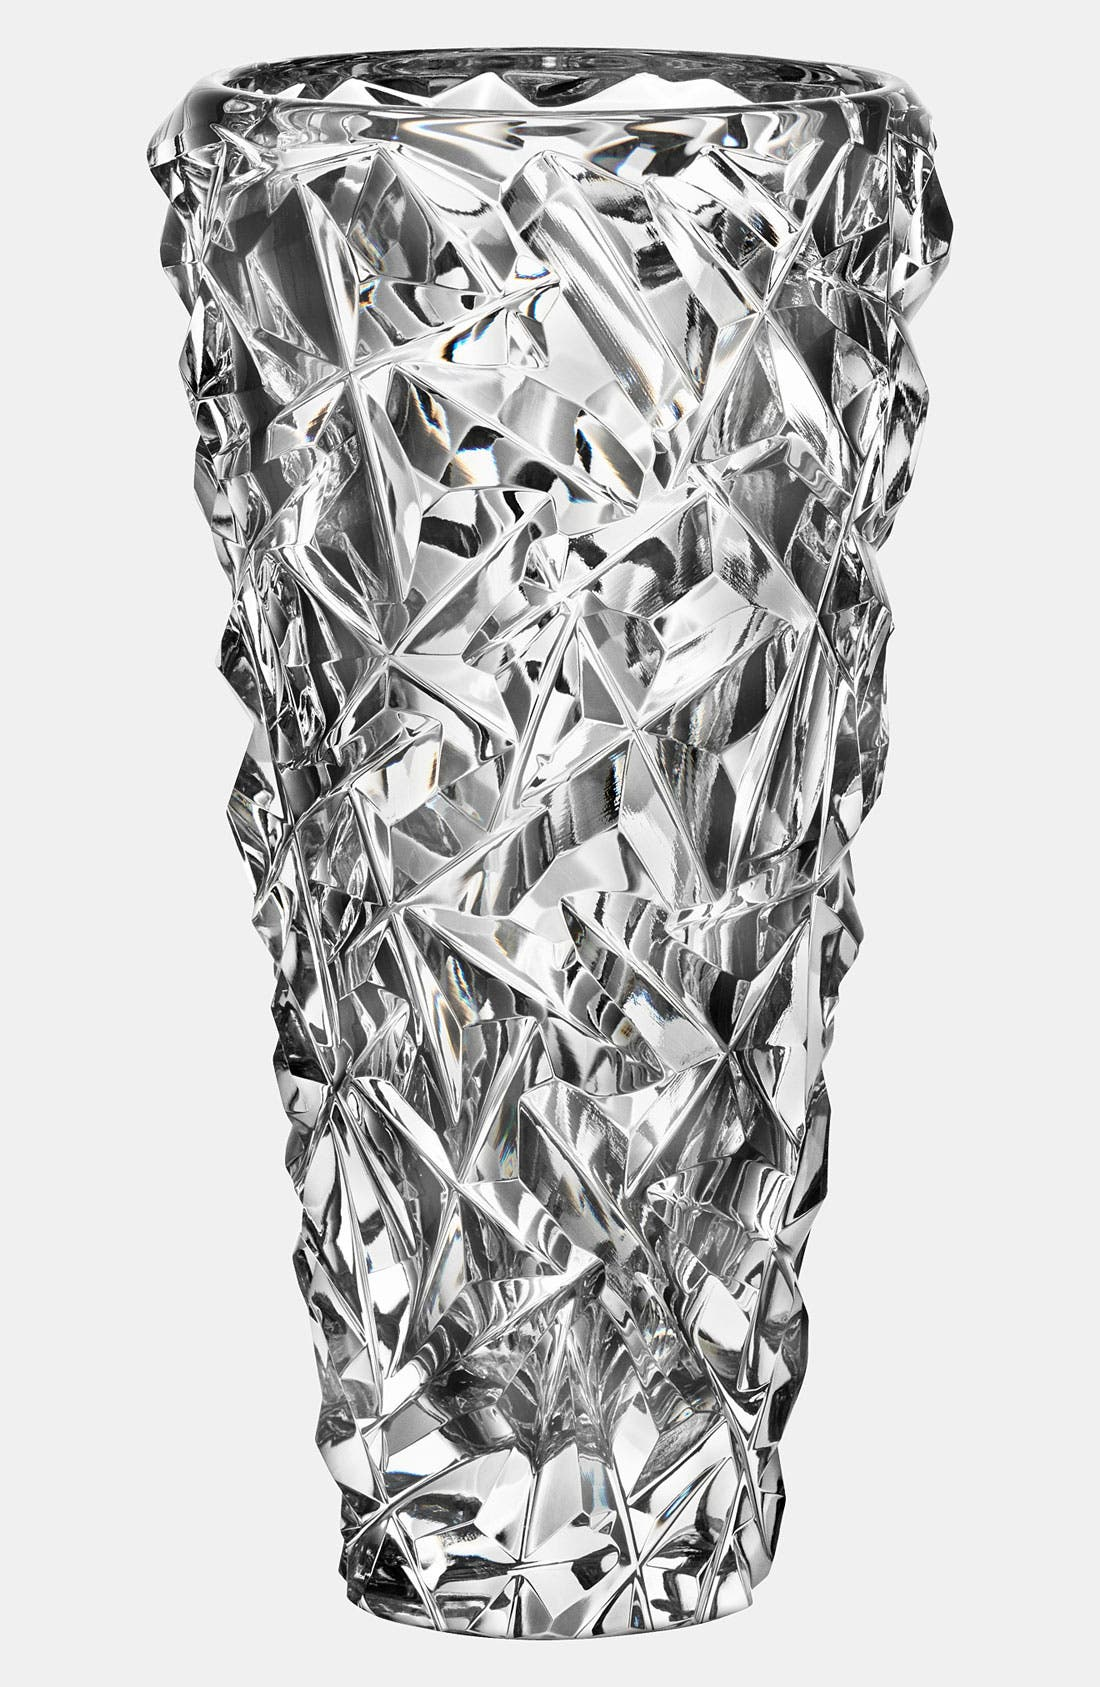 Main Image - Orrefors 'Carat - Small' Vase